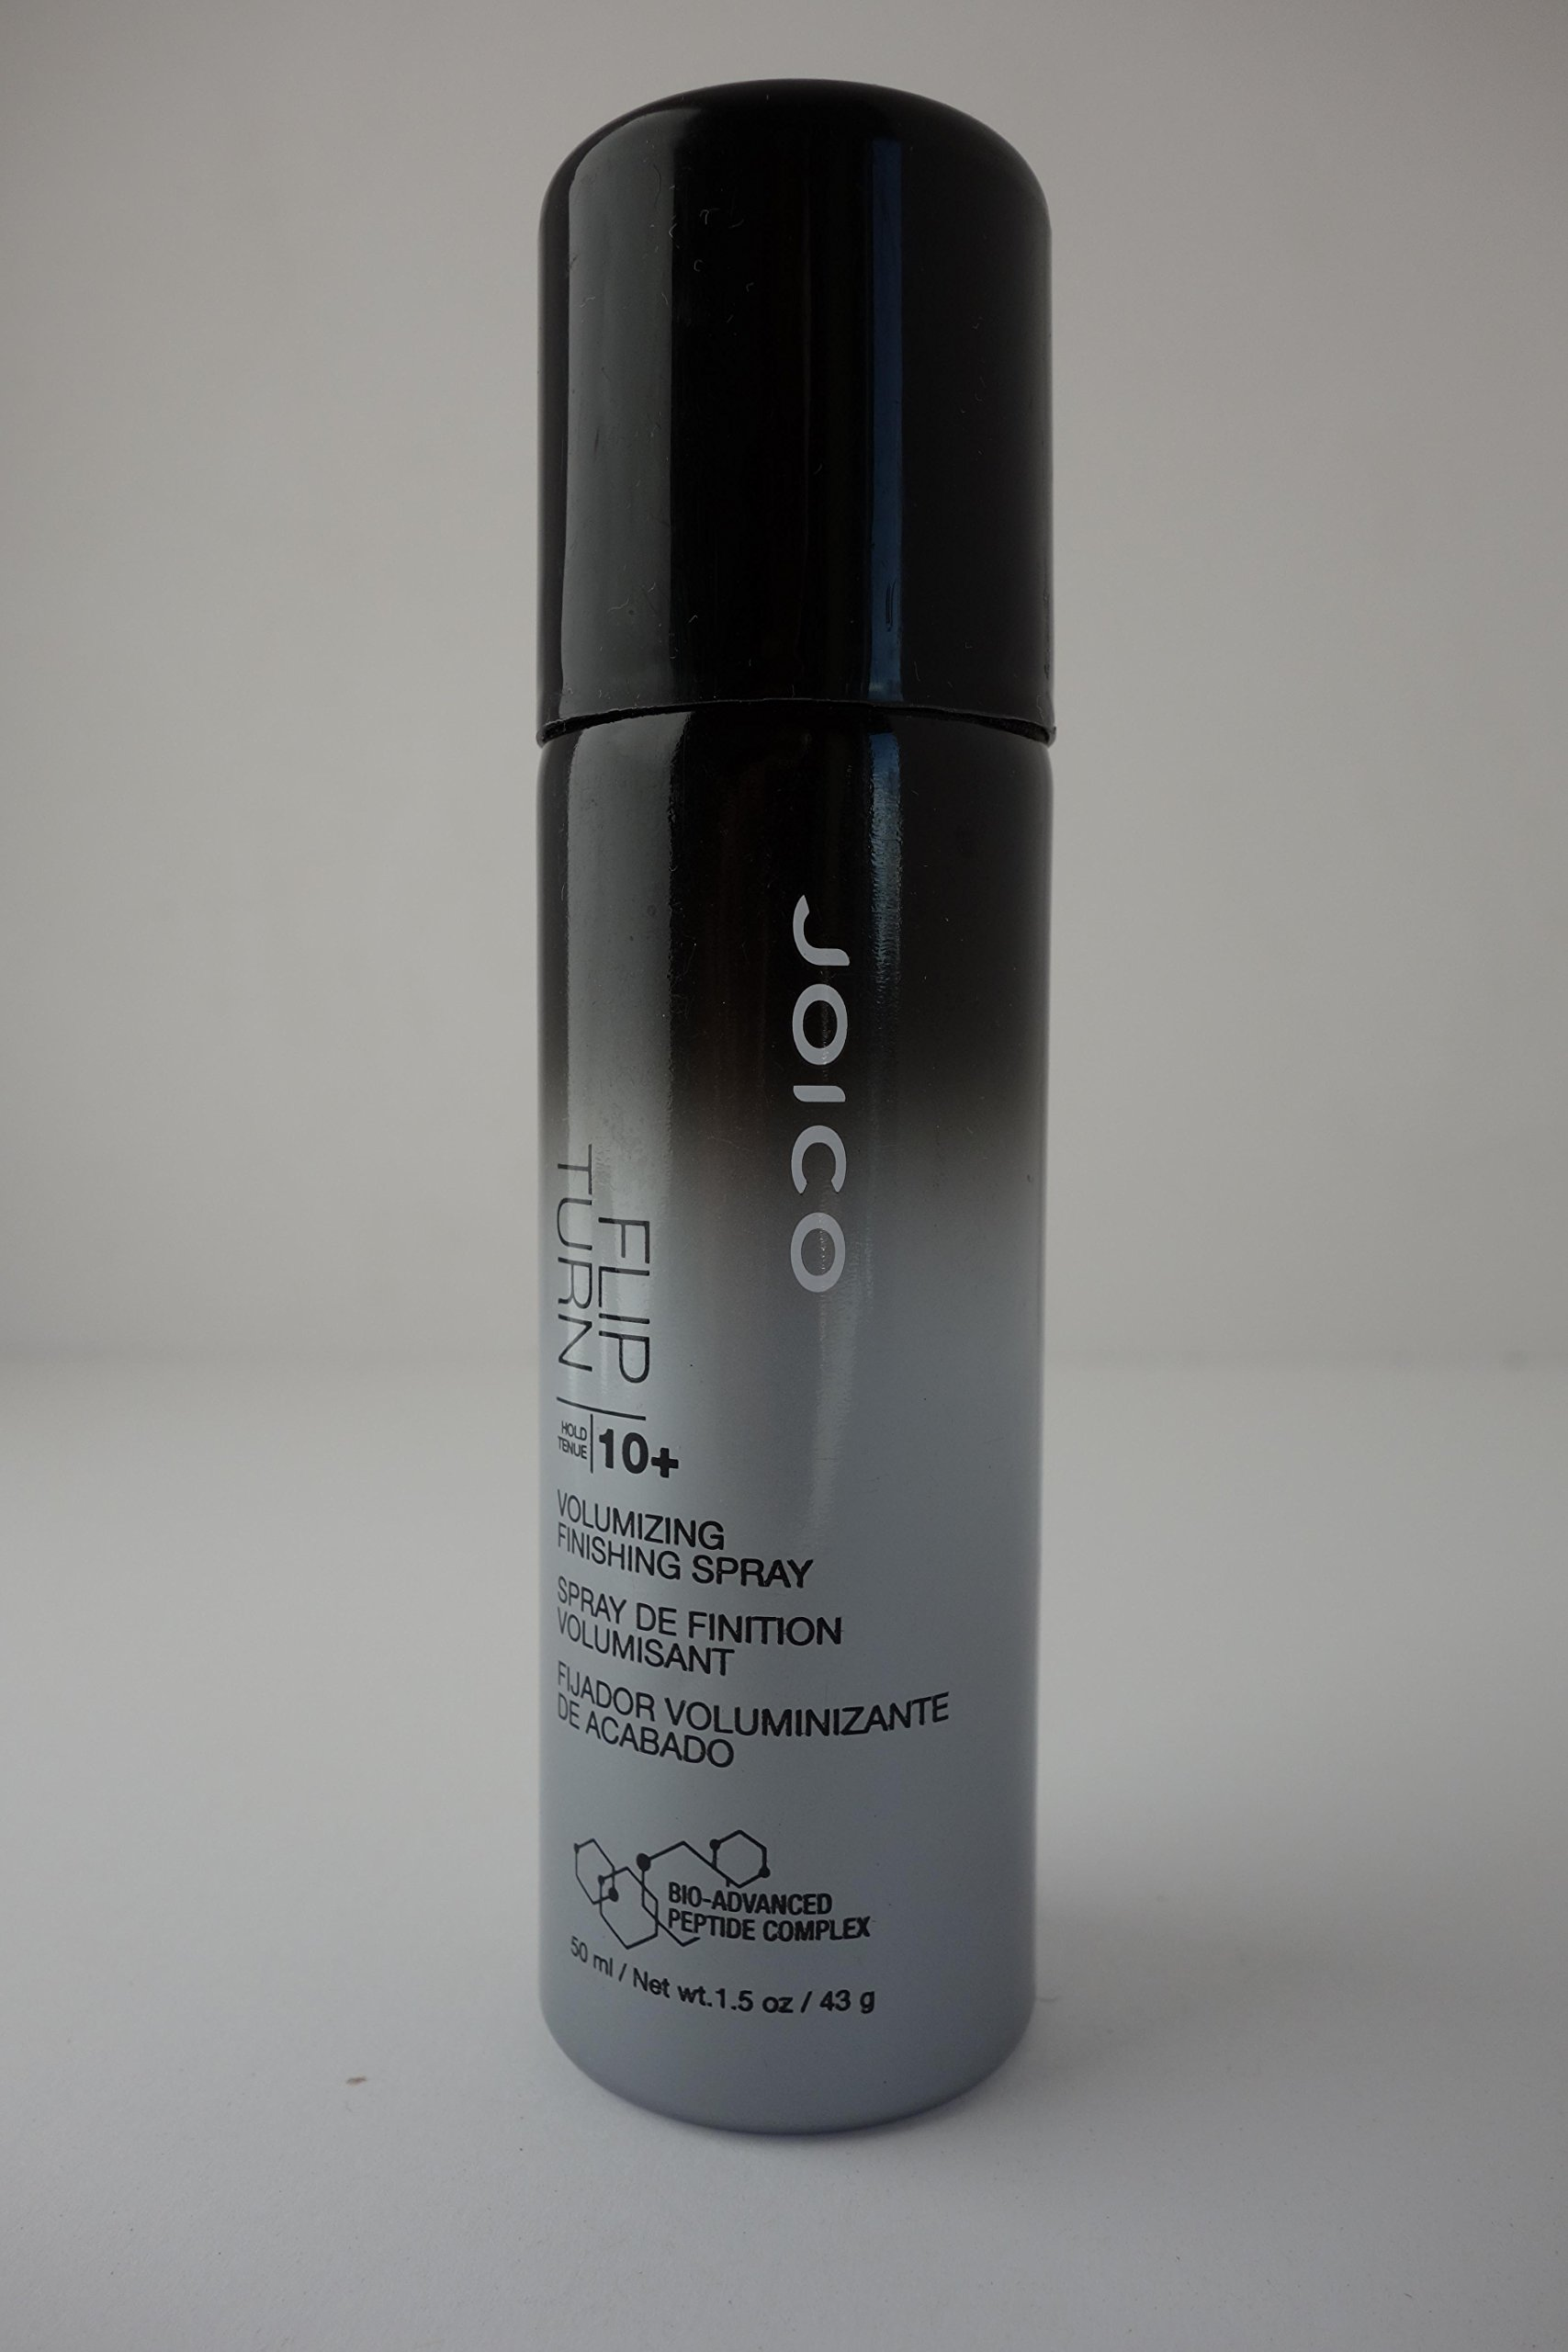 Joico Flip Turn Volumizing Finishing Spray, 1.5 Ounce